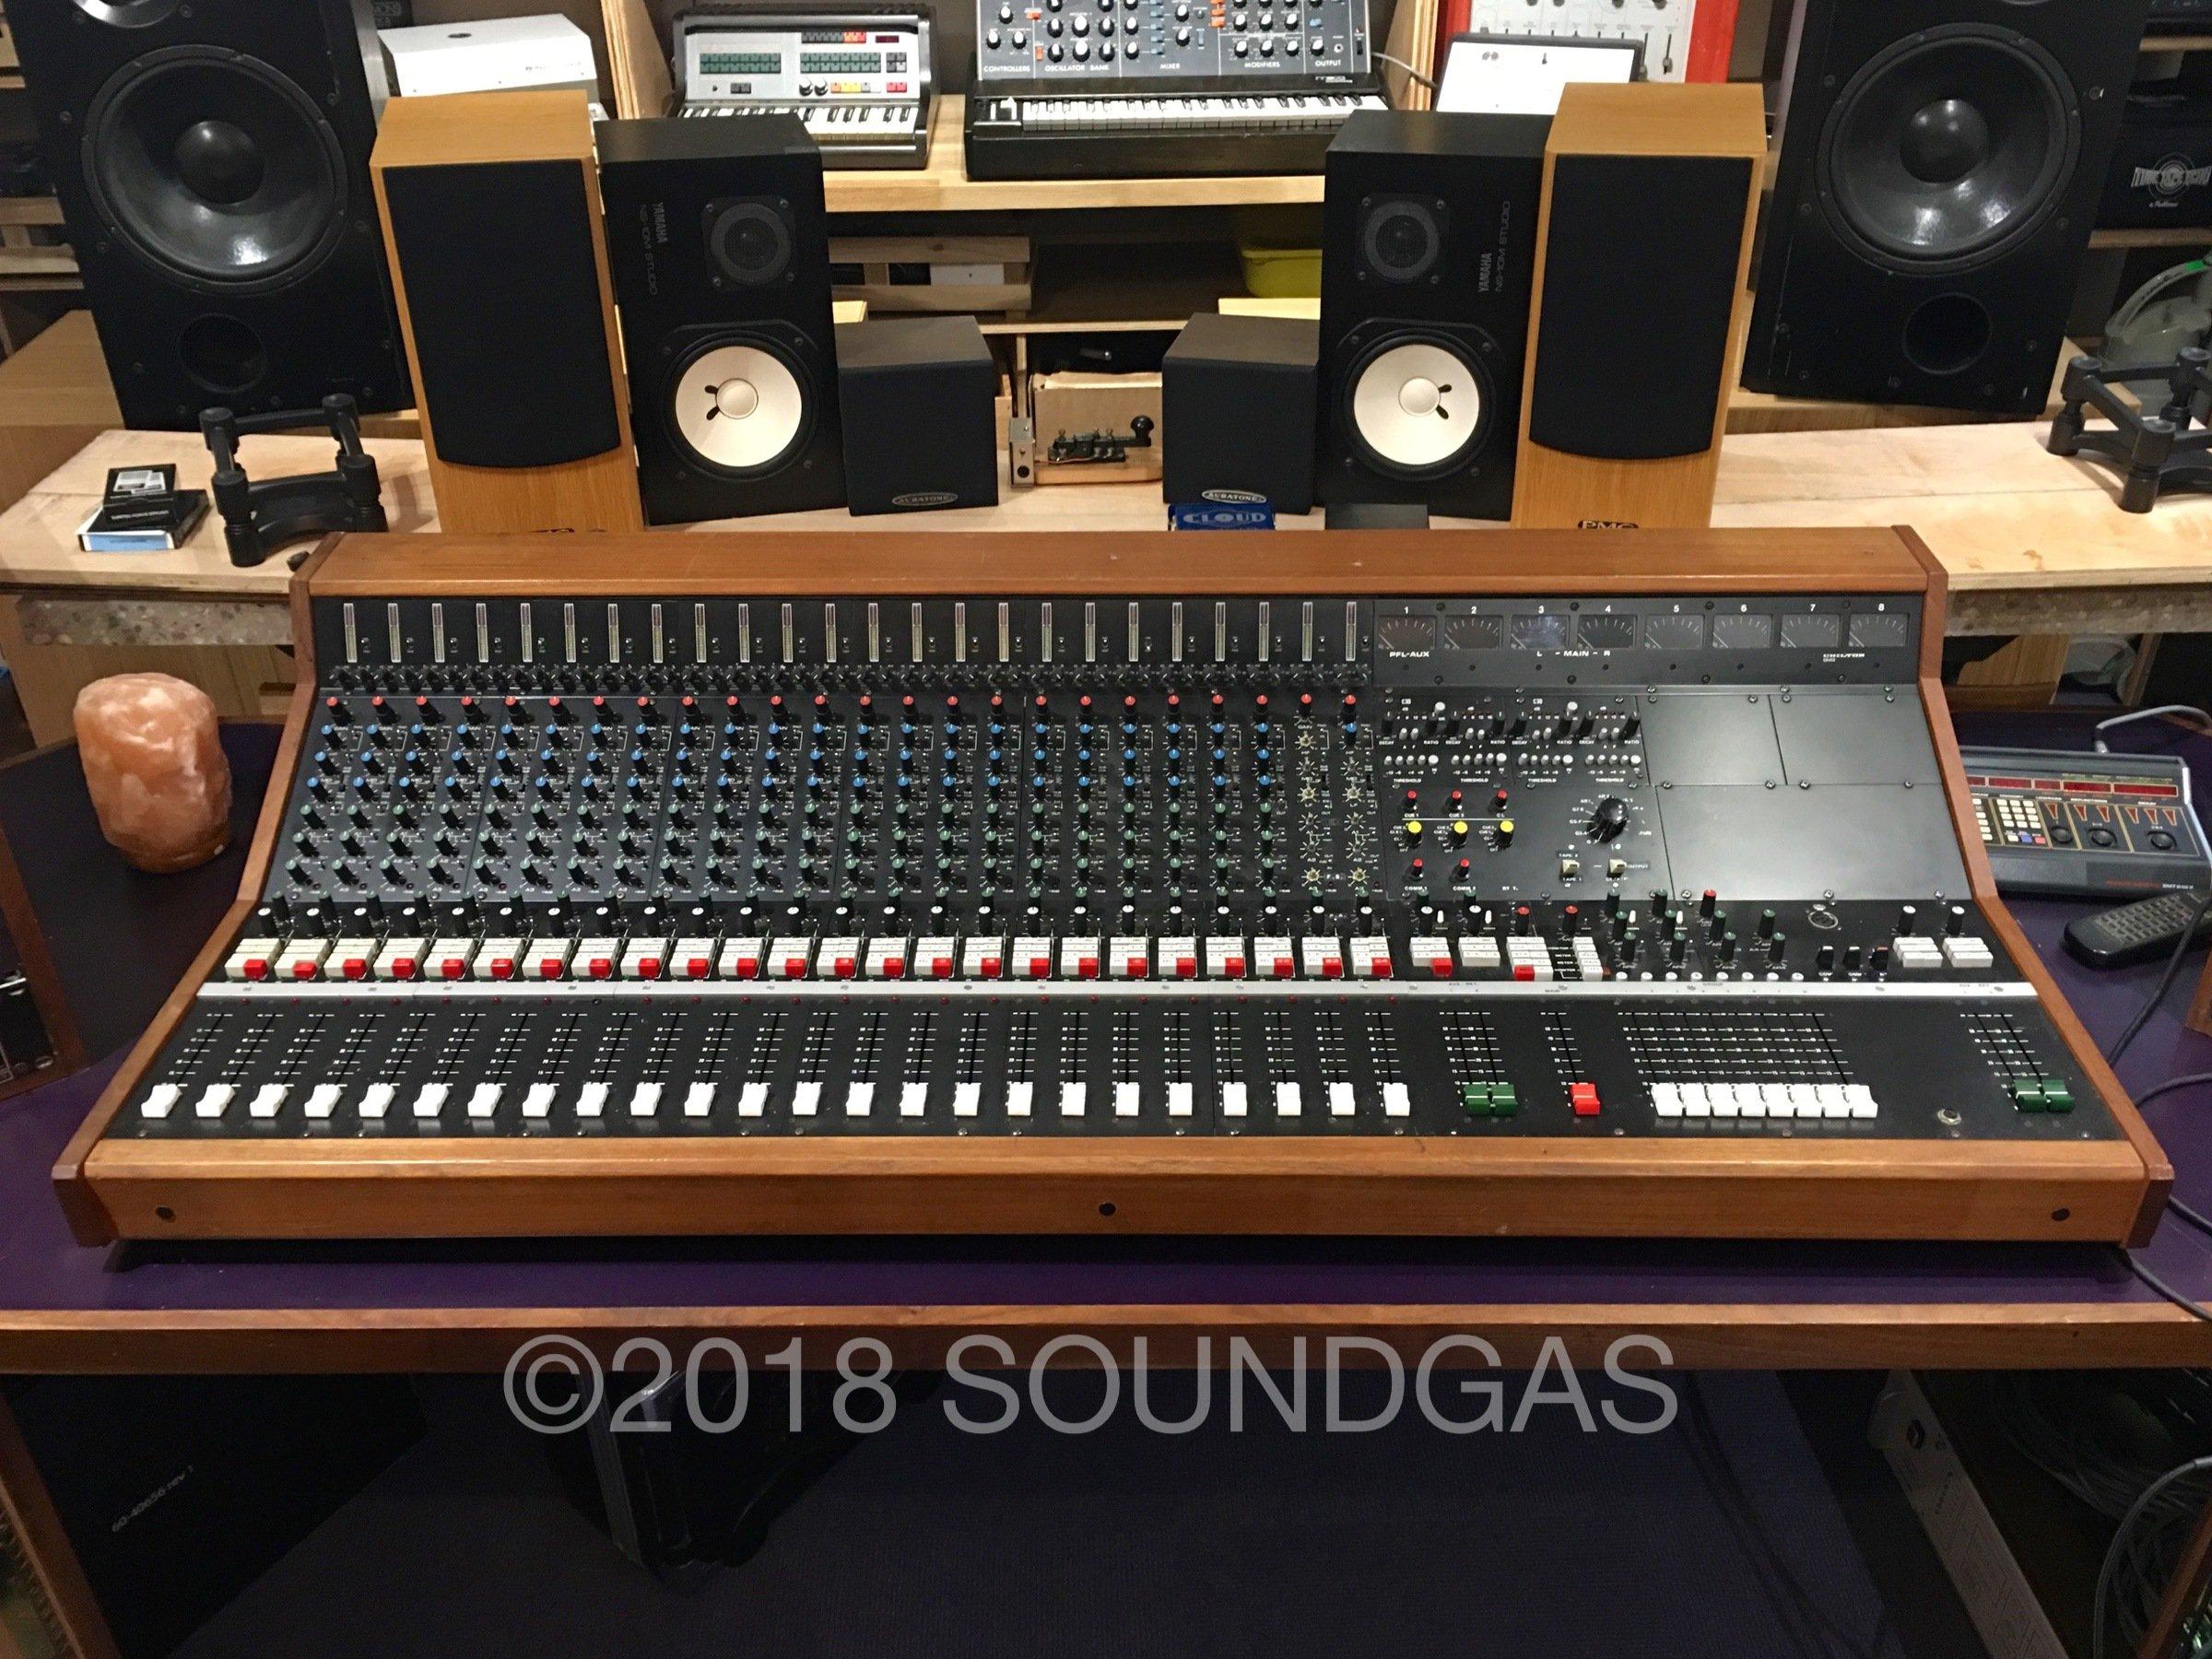 Chilton-QM3-24-8-2-Mixing-Console-1-1.jp